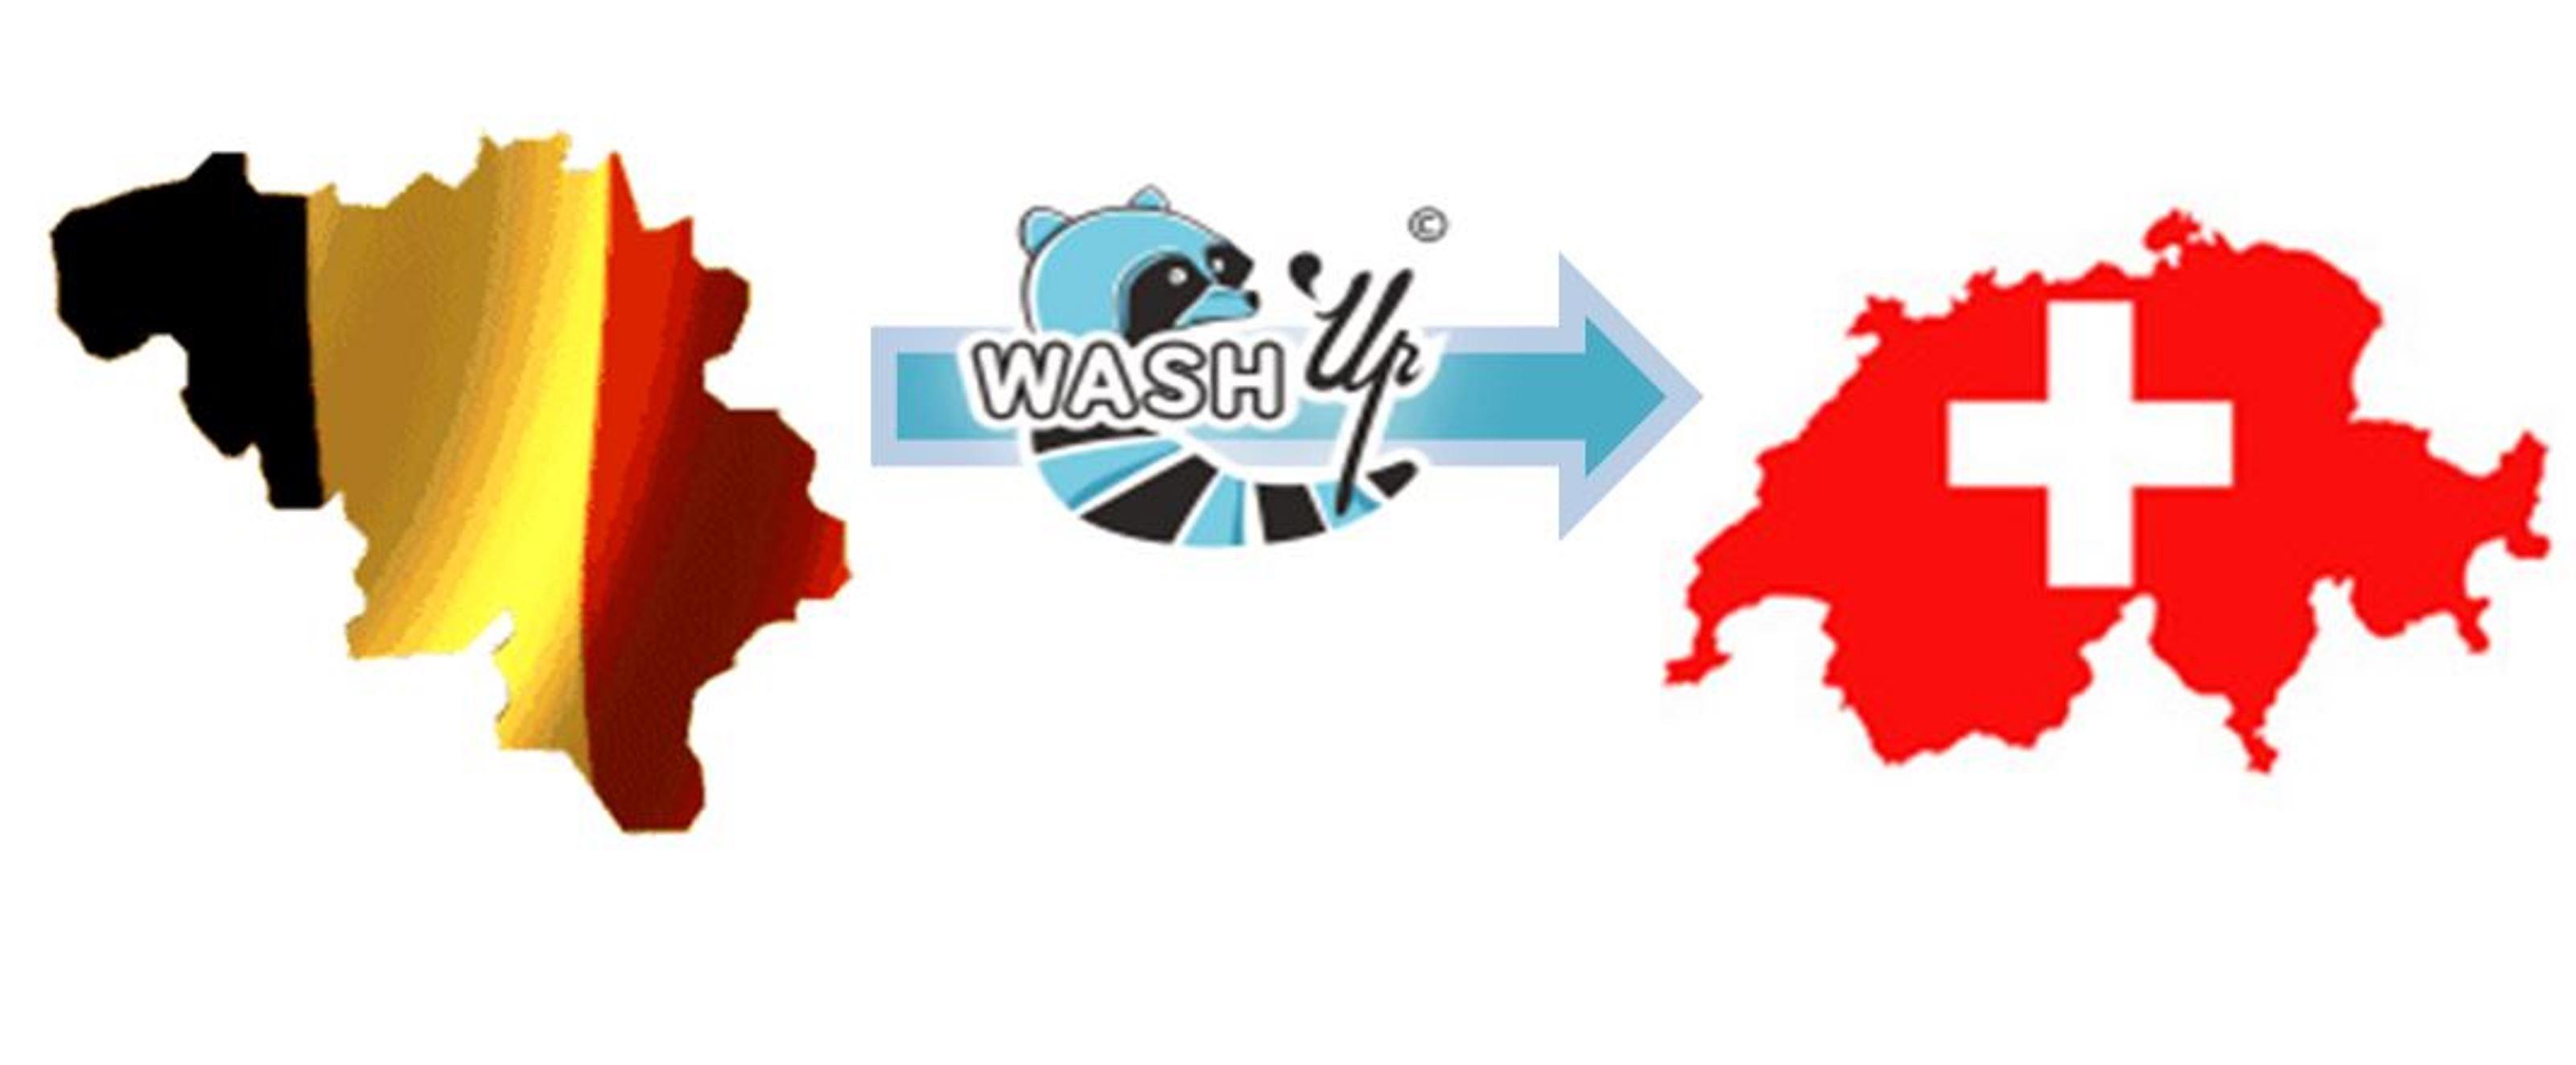 WASH 'Up s'internationalise… vers la Suisse!